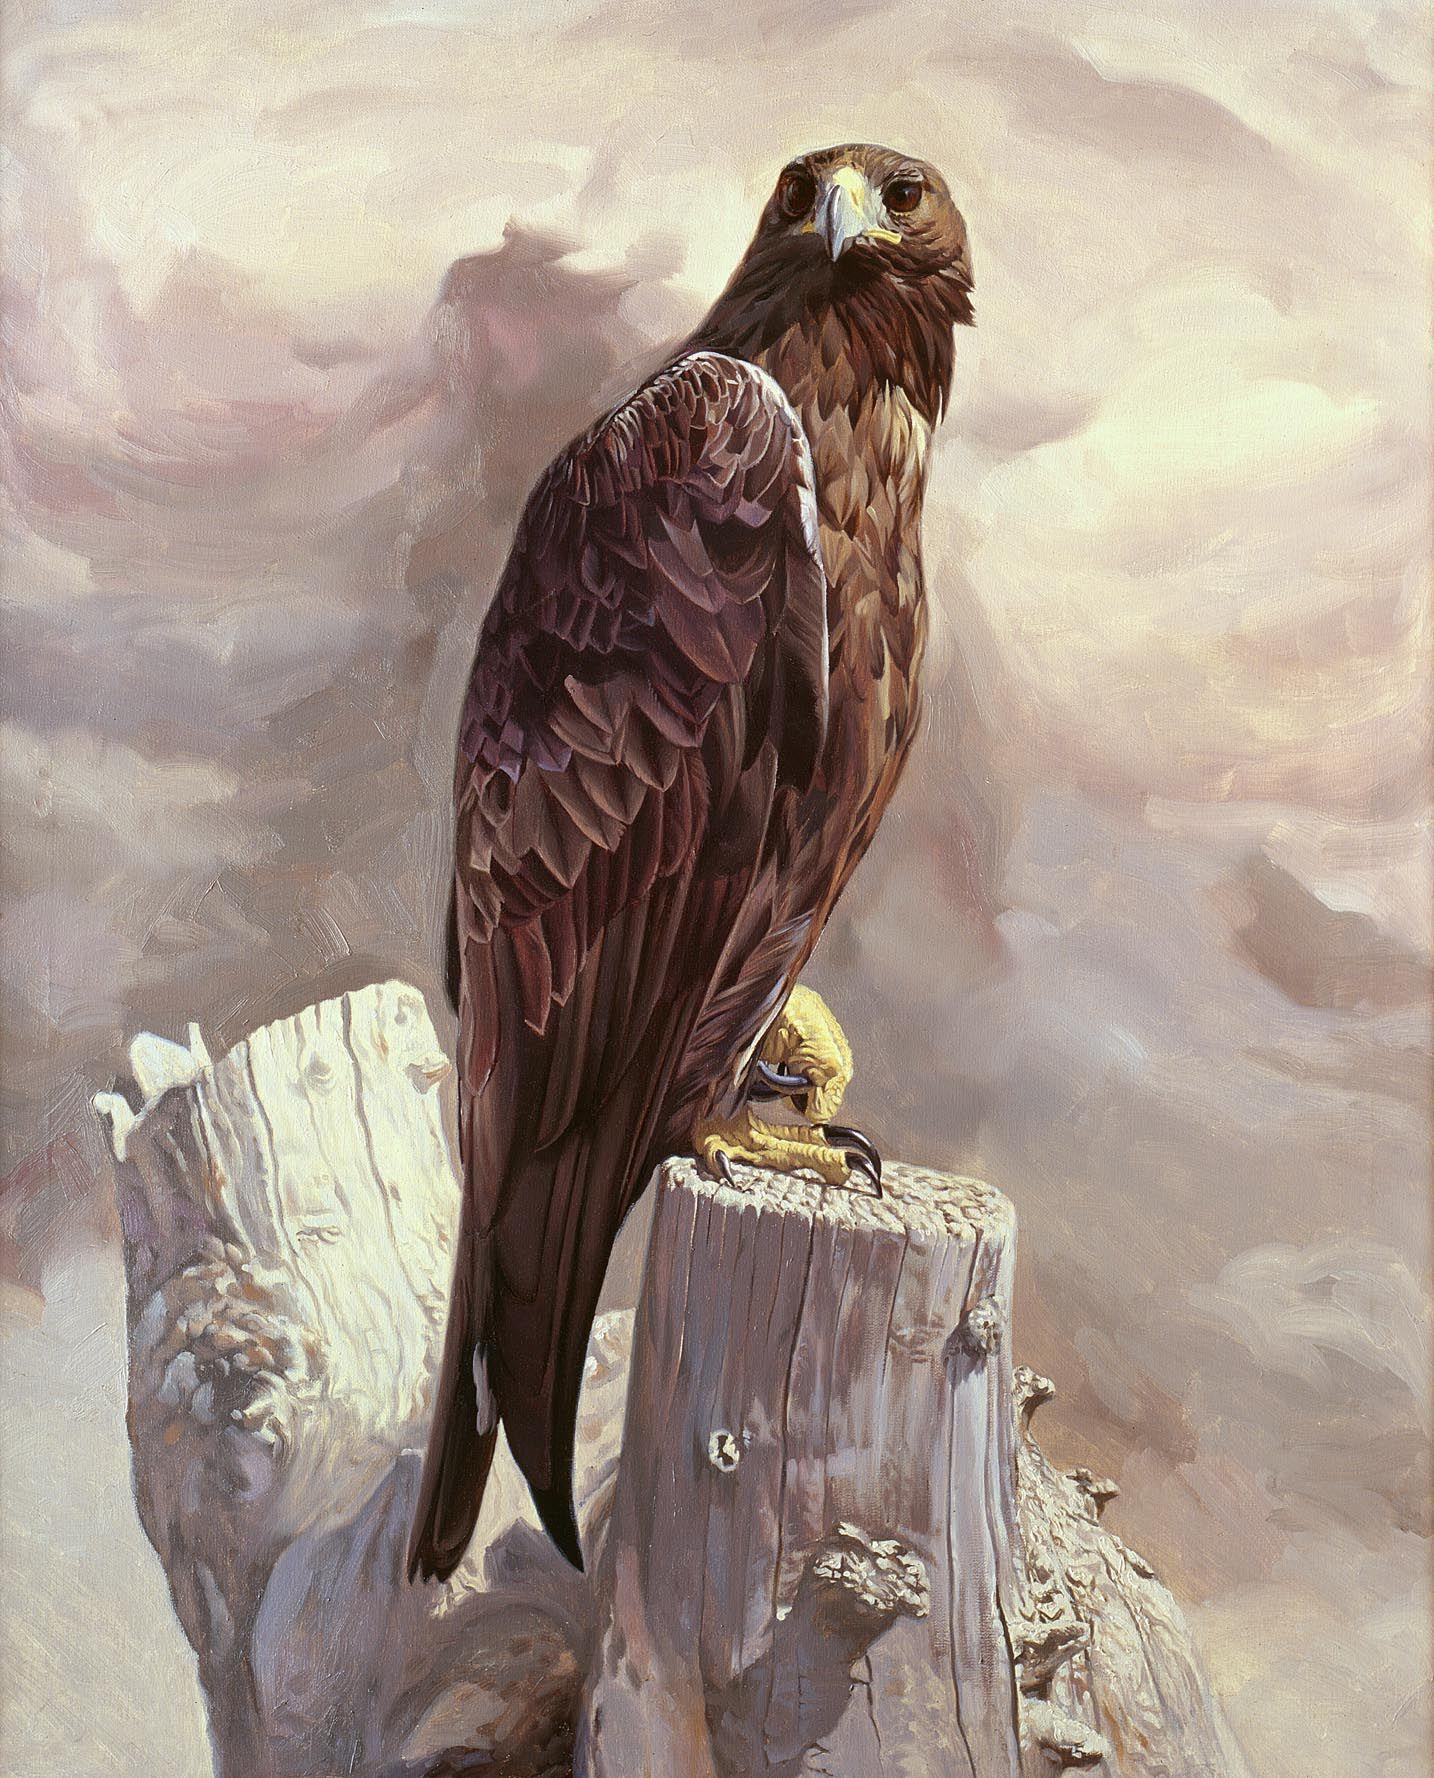 Mystical Creatures In The Fall Wallpaper Nerea Golden Eagle Portrait Quot Wildlife Art Of Manuel